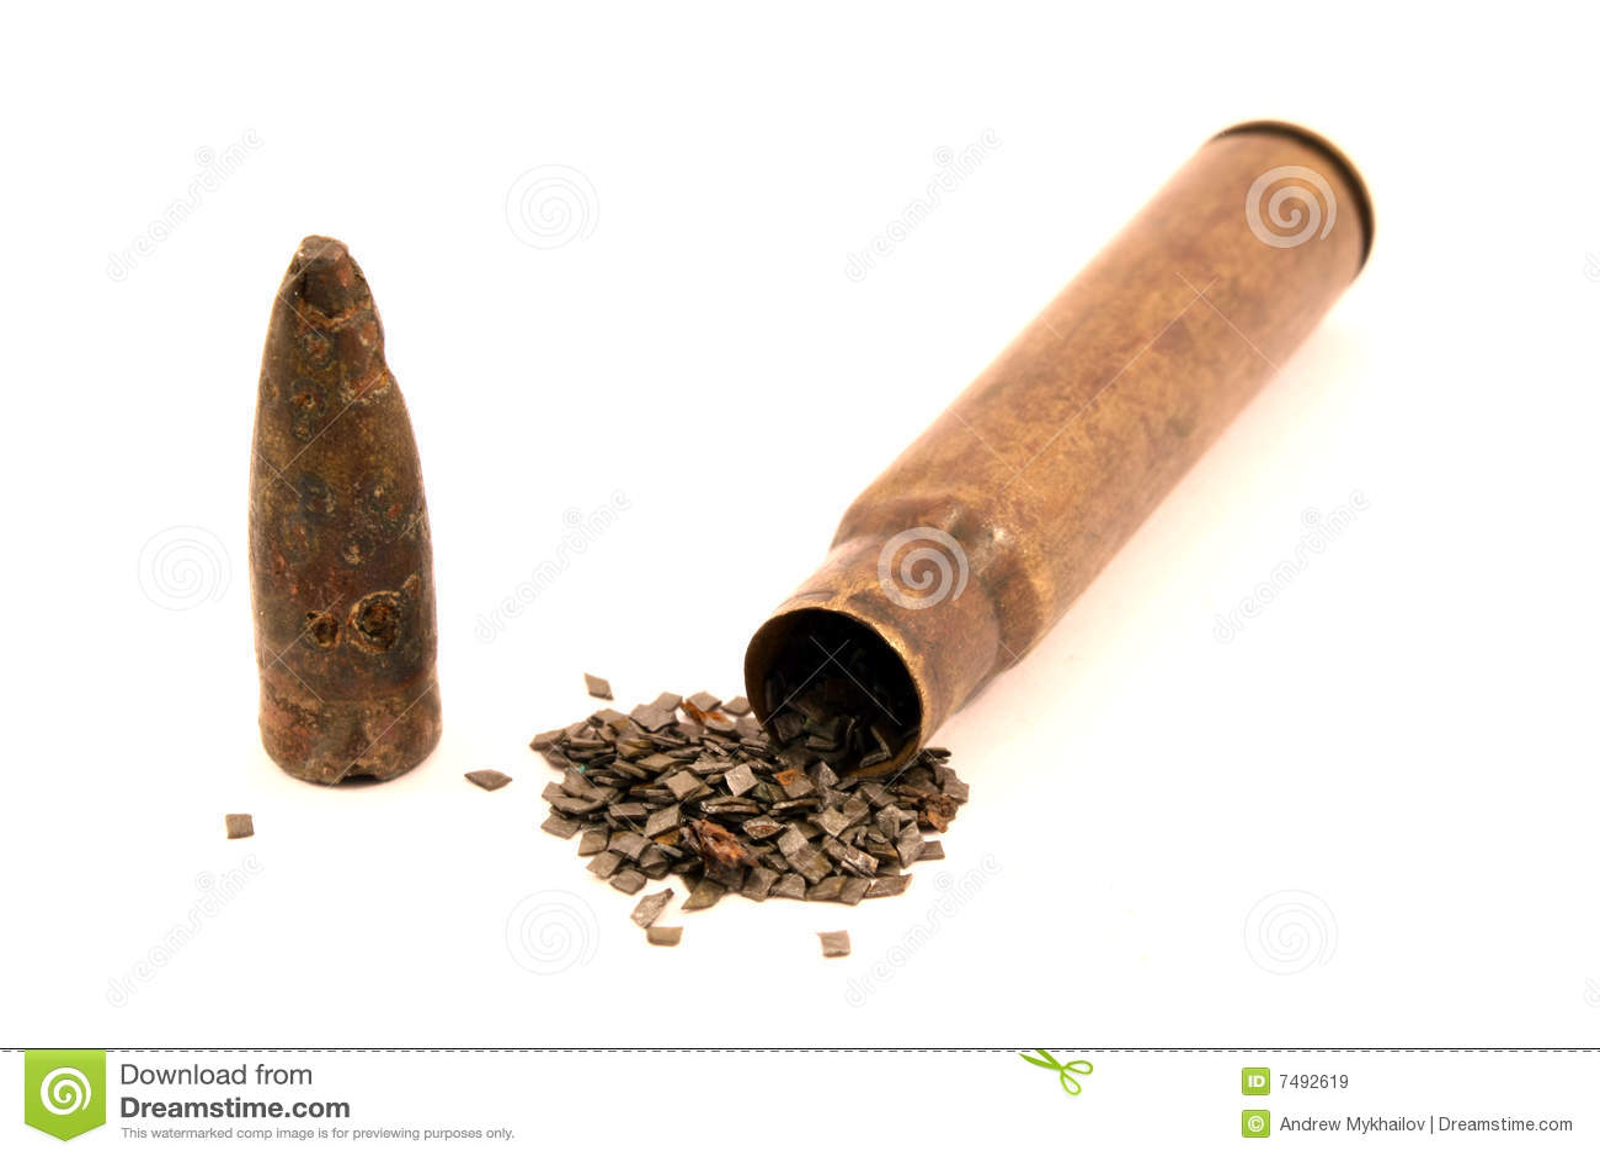 Gun Powder for Sale: